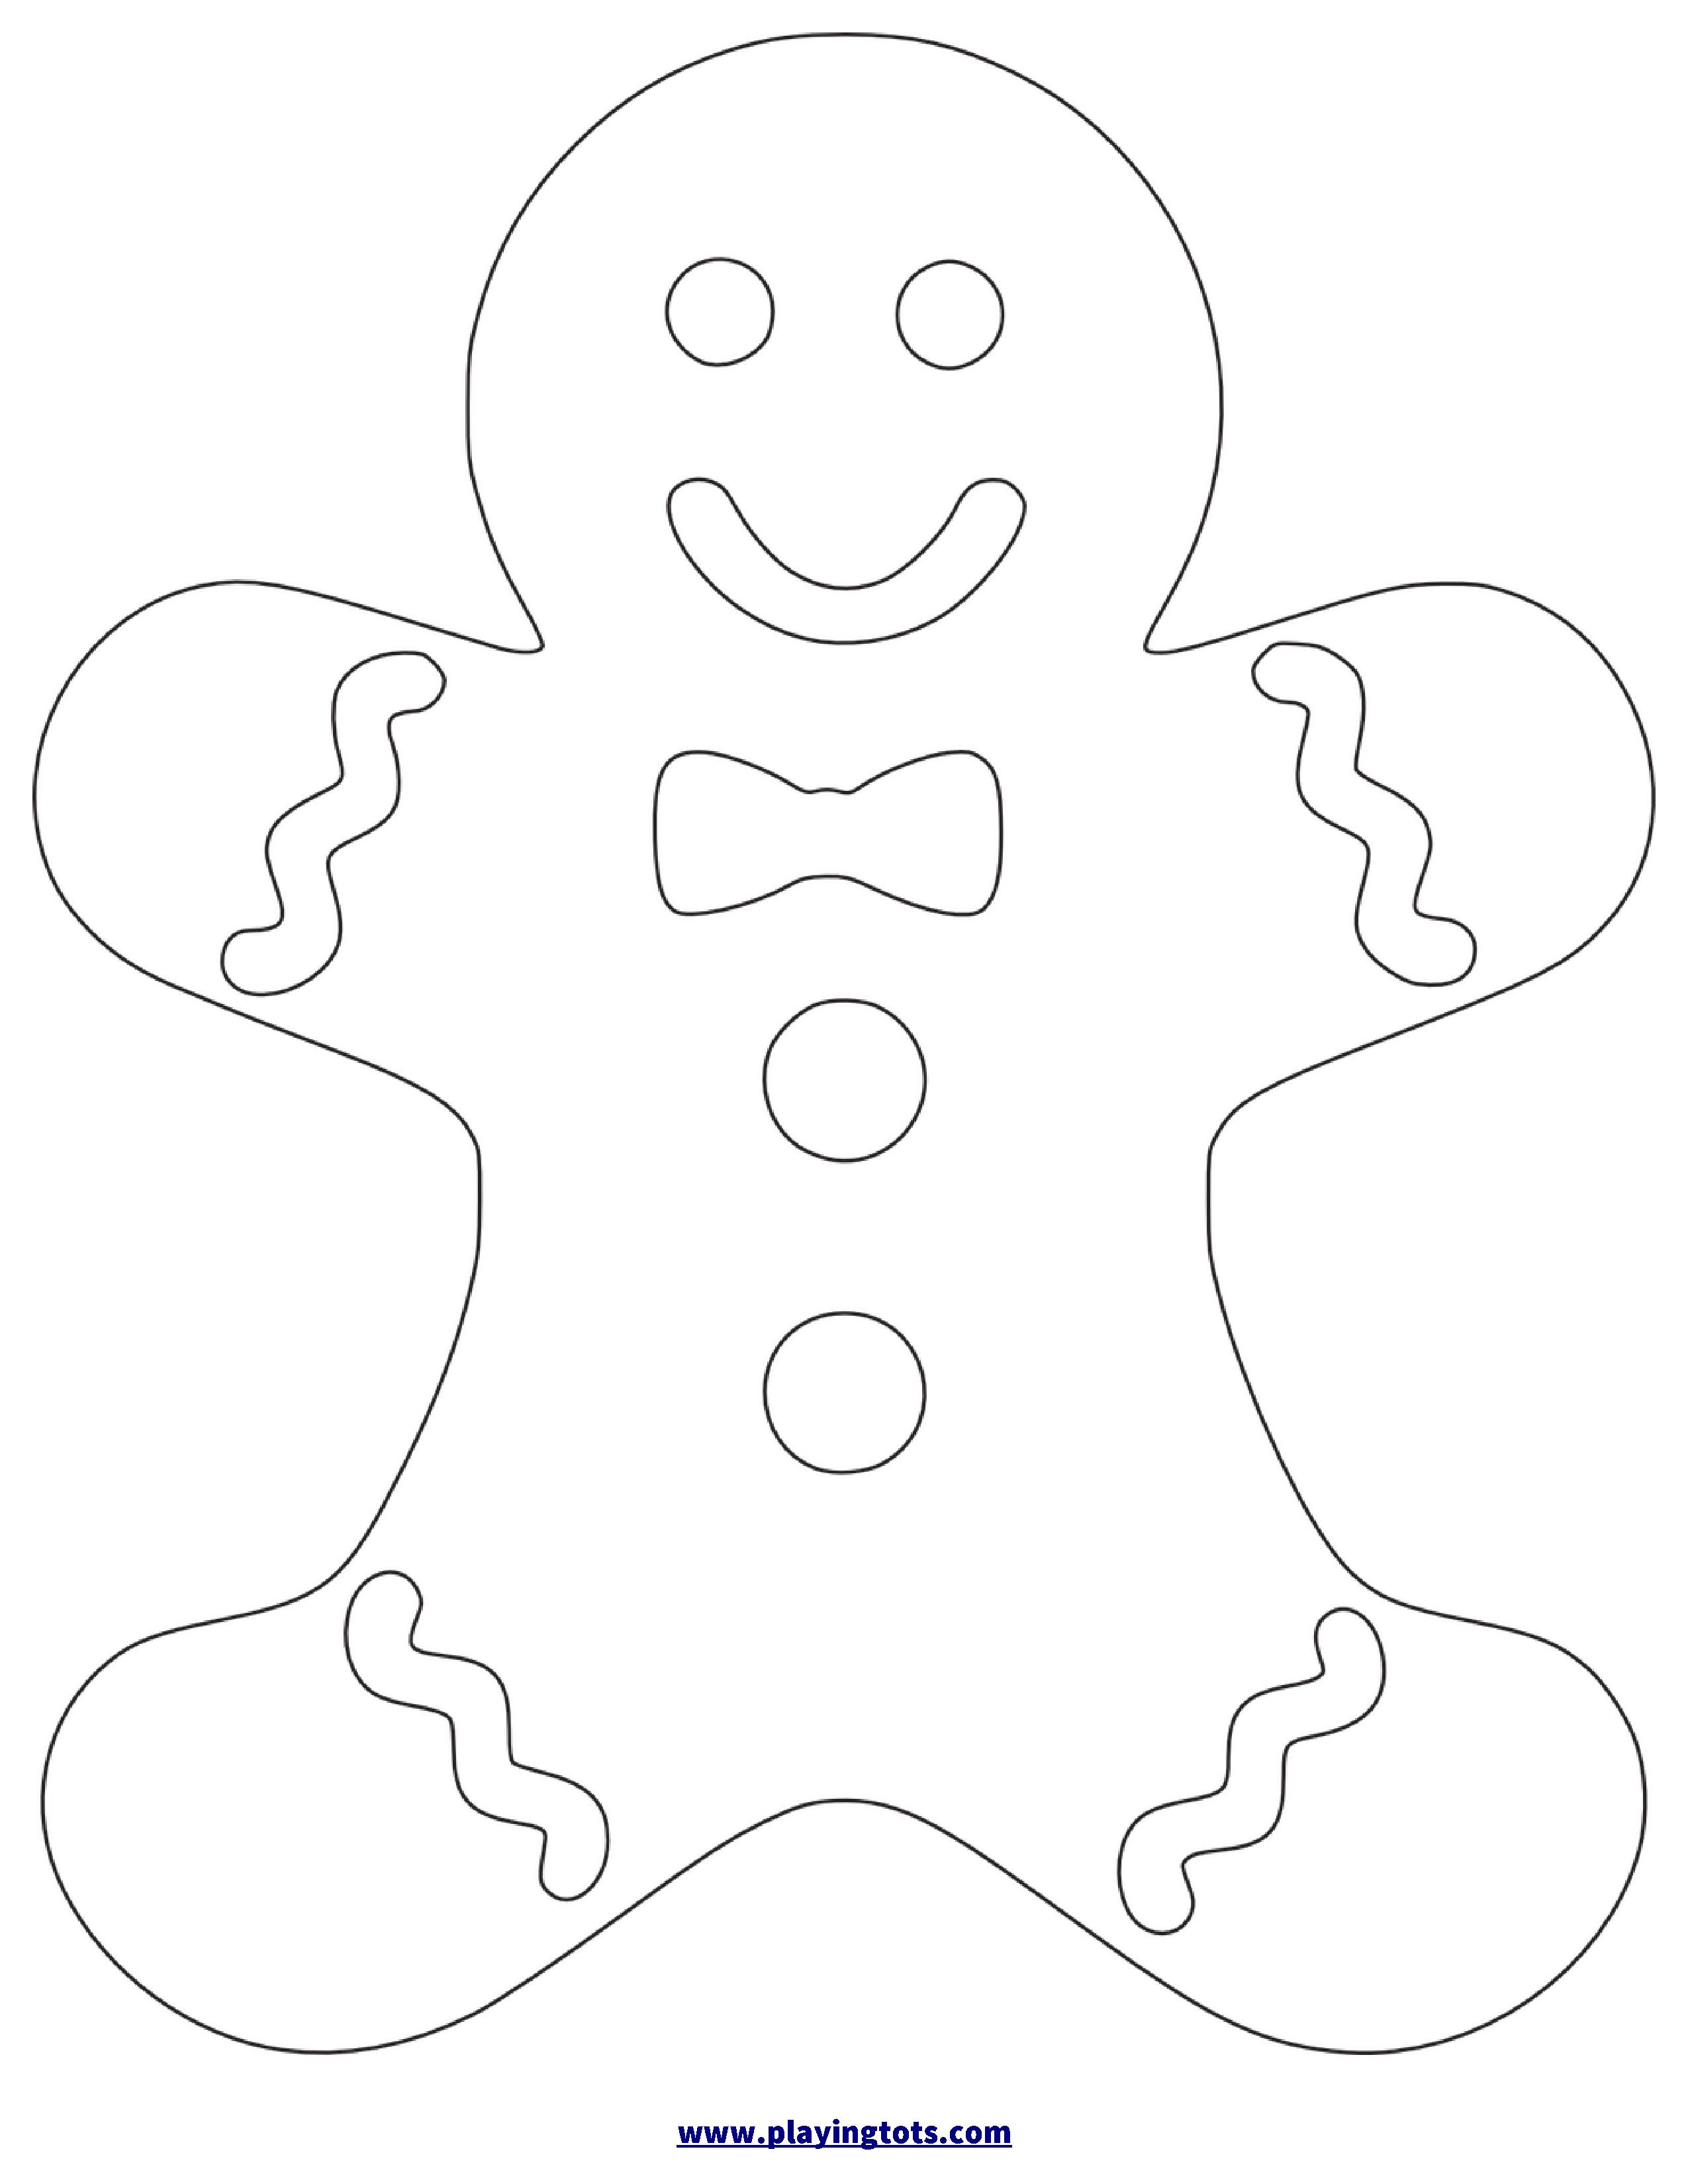 Free Printable Gingerbread Man Worksheet | Christmas Crafts - Free Printable Gingerbread Man Activities